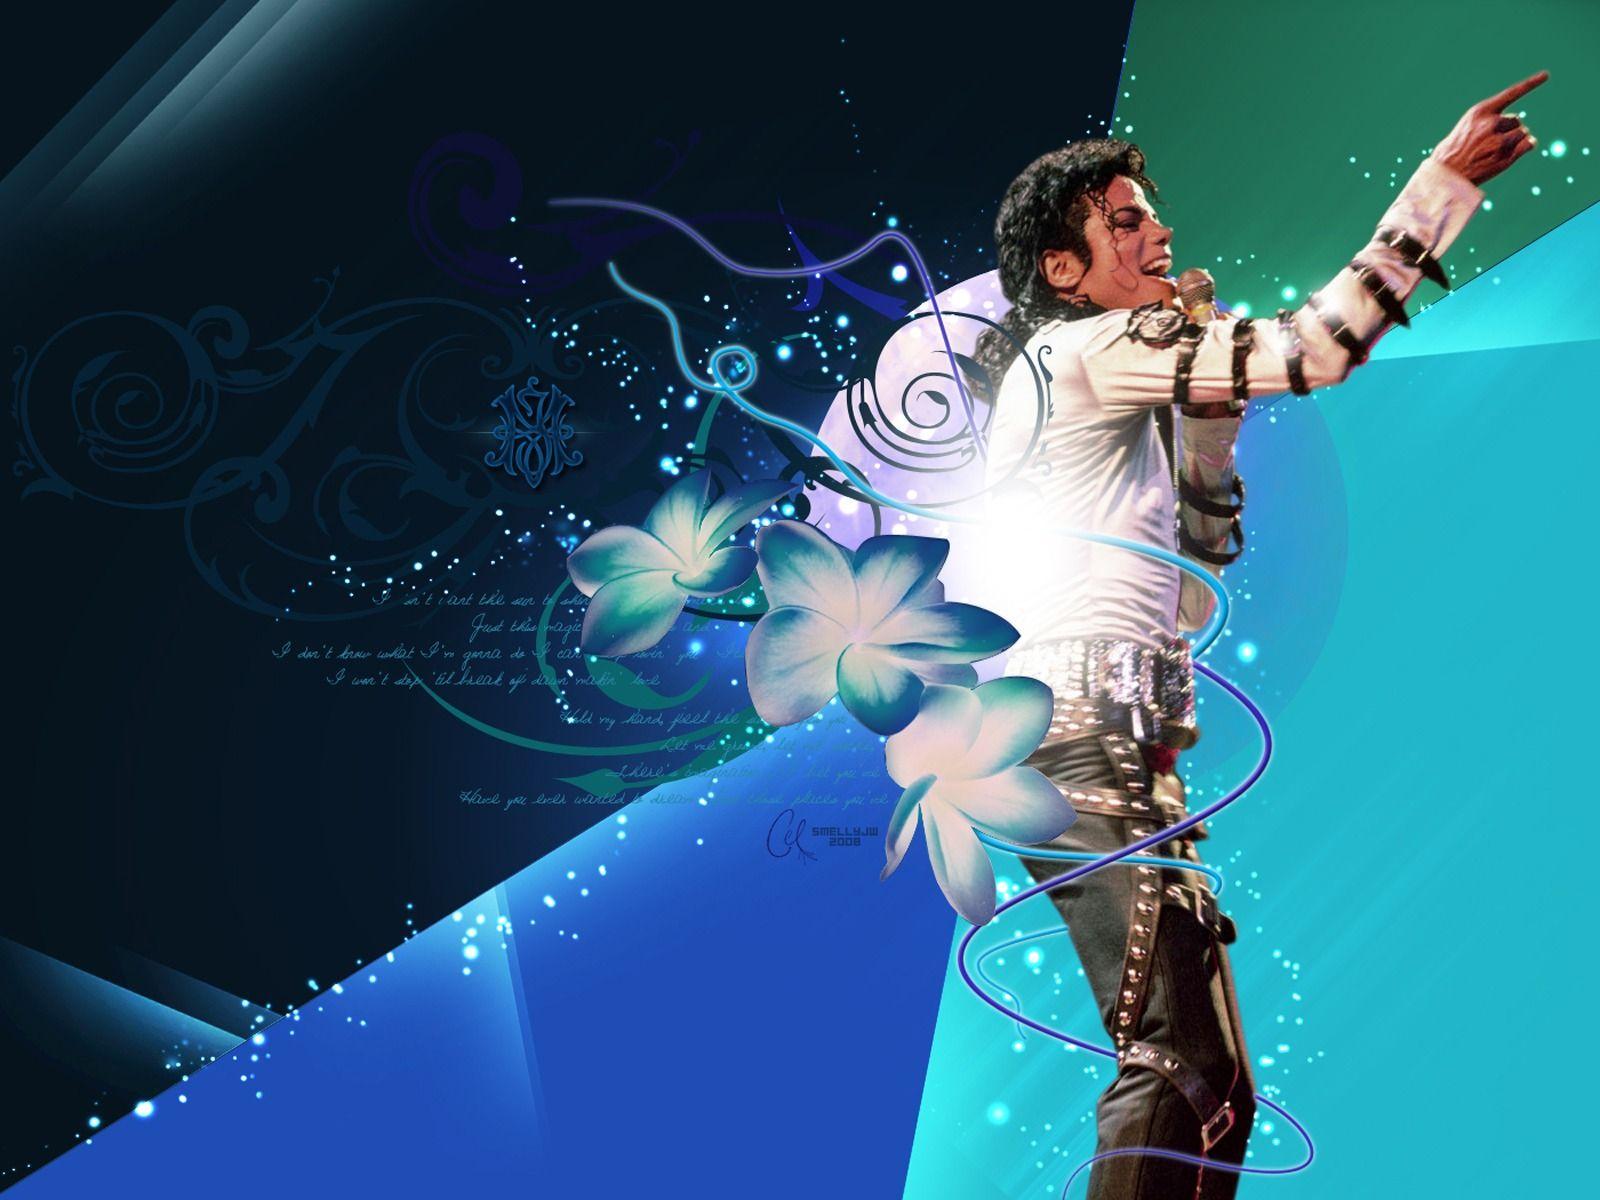 Michael Jackson Hd Wallpaper Http 1sthdwallpapers Com Michael Jackson Hd Wallpapers